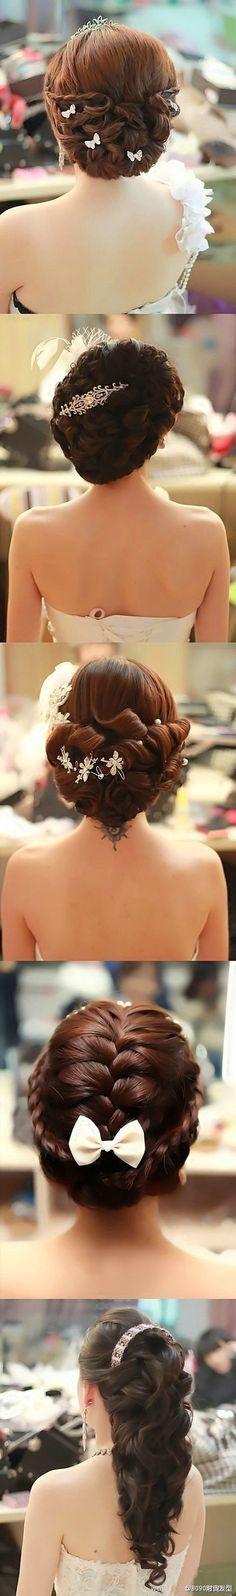 hairstyle for wedding - zzkko.com